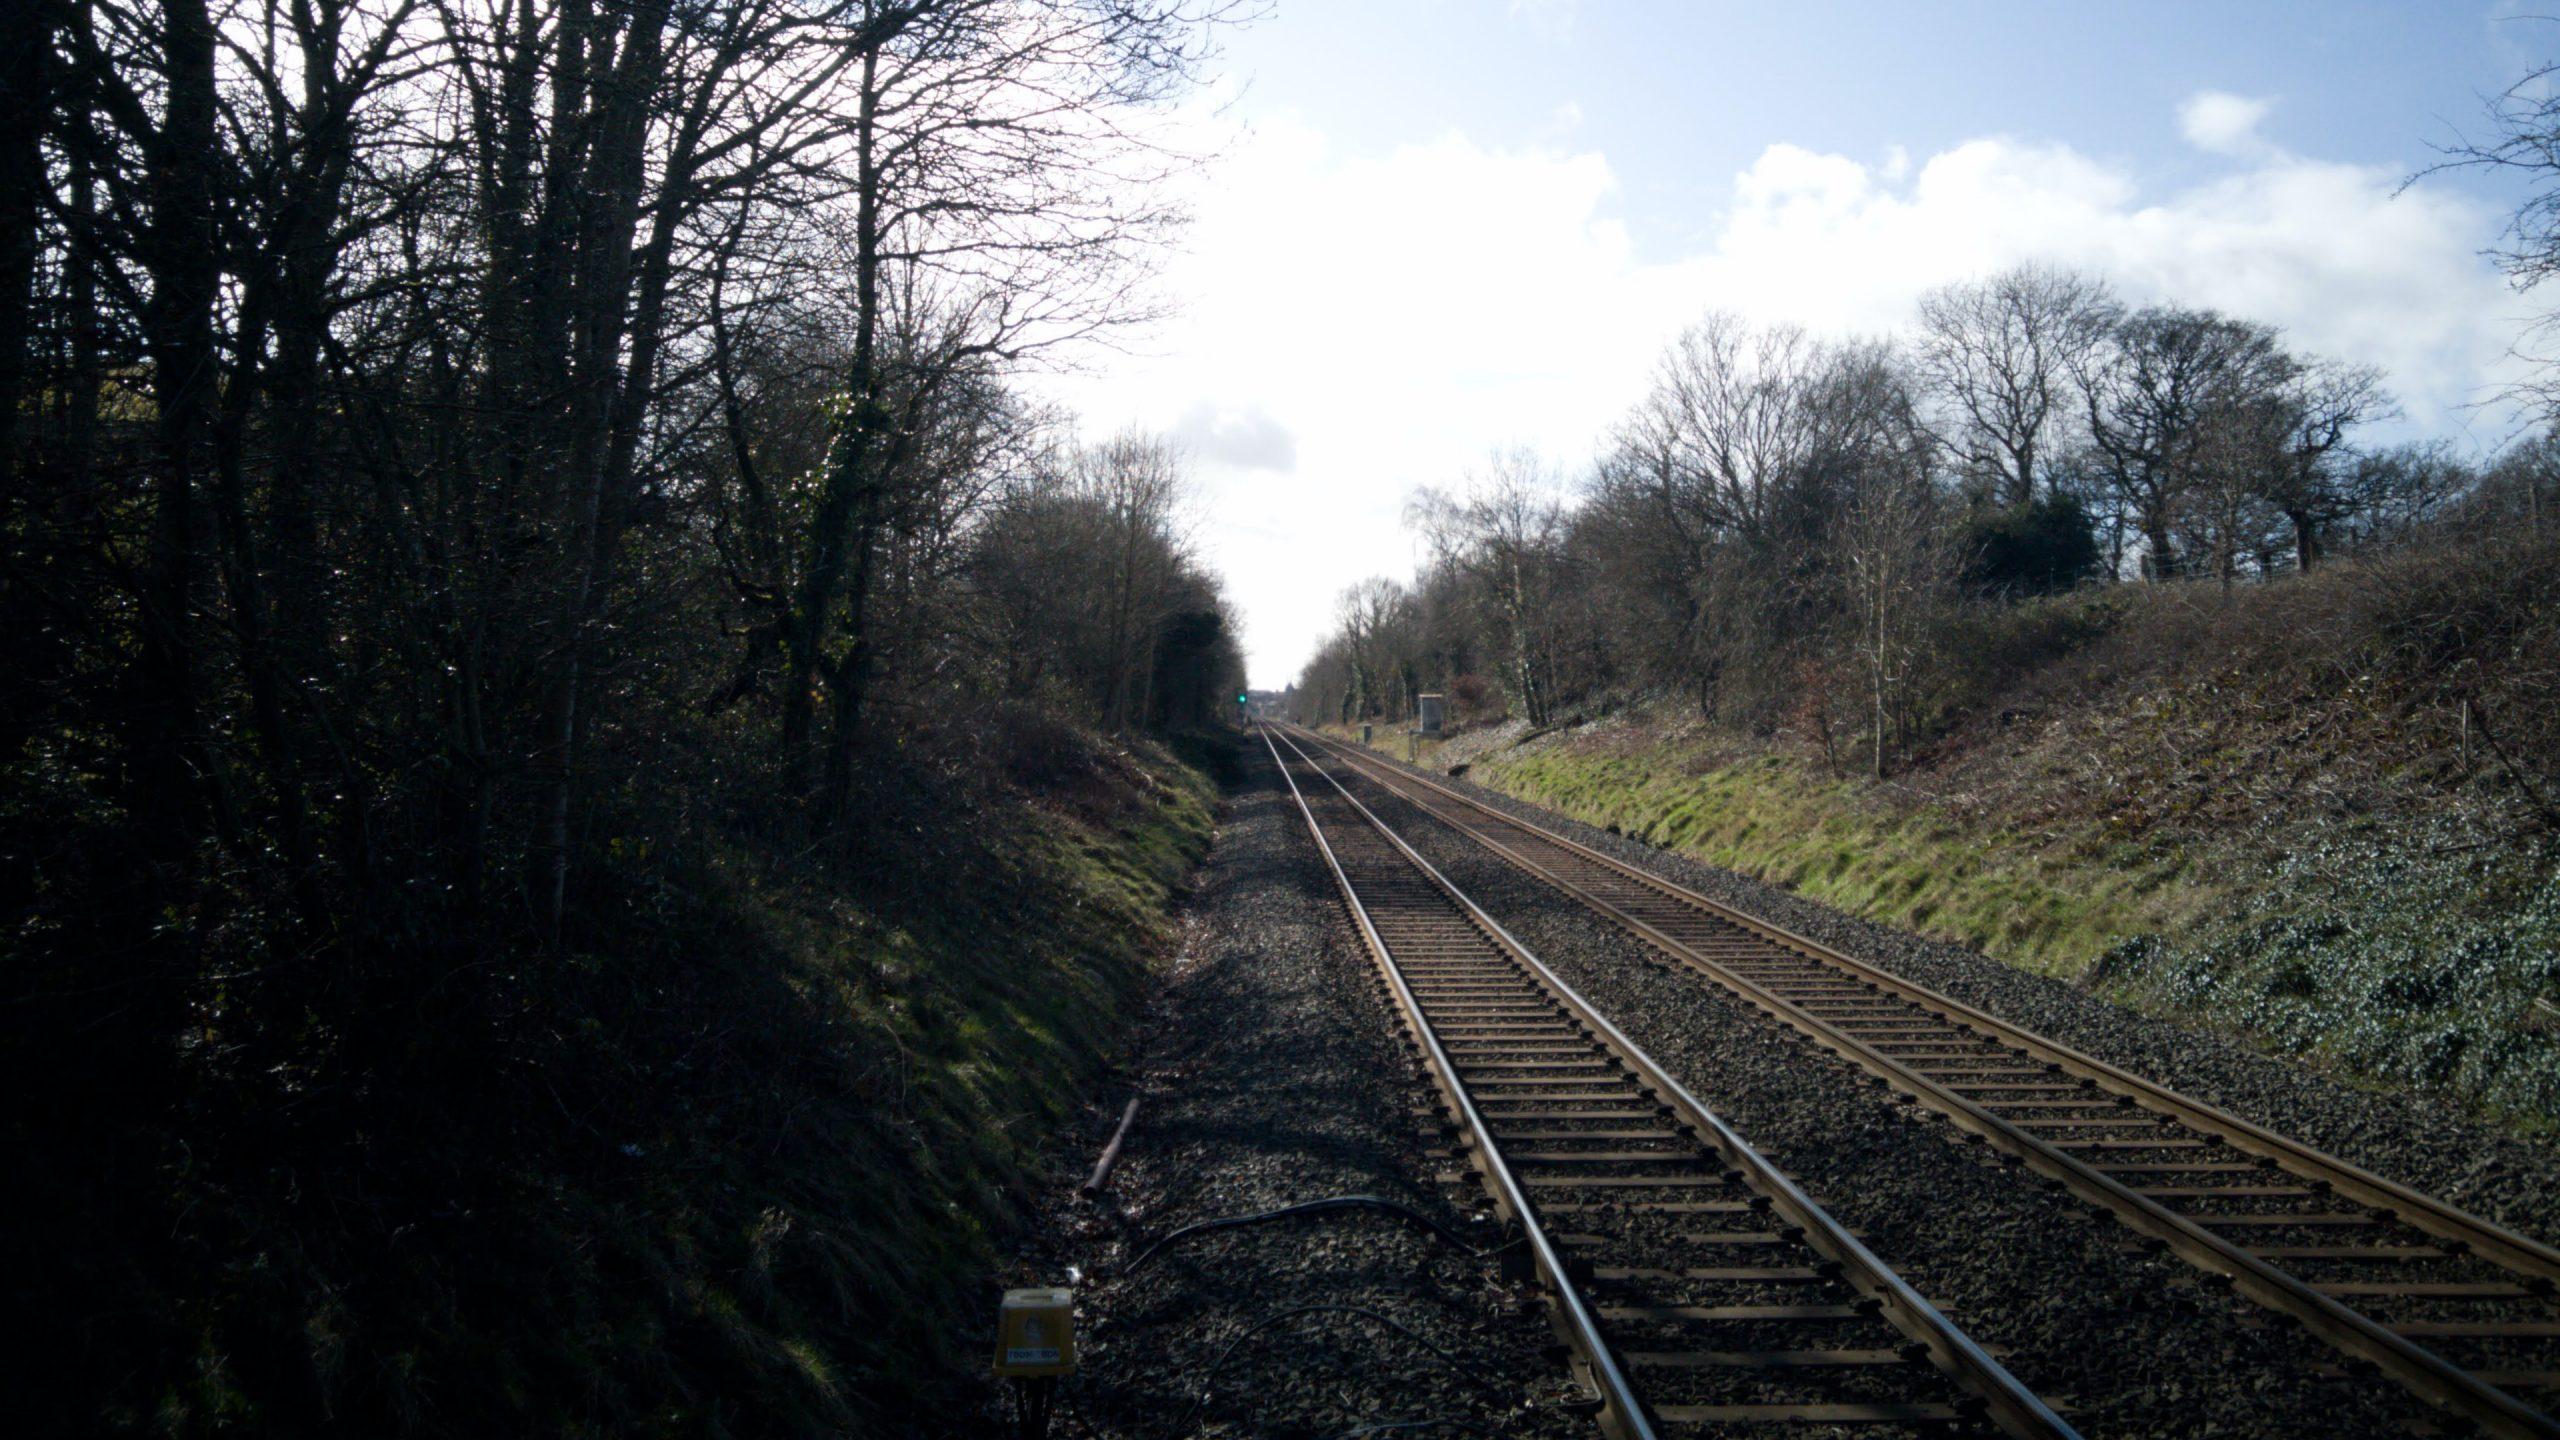 Train tracks in Solihull